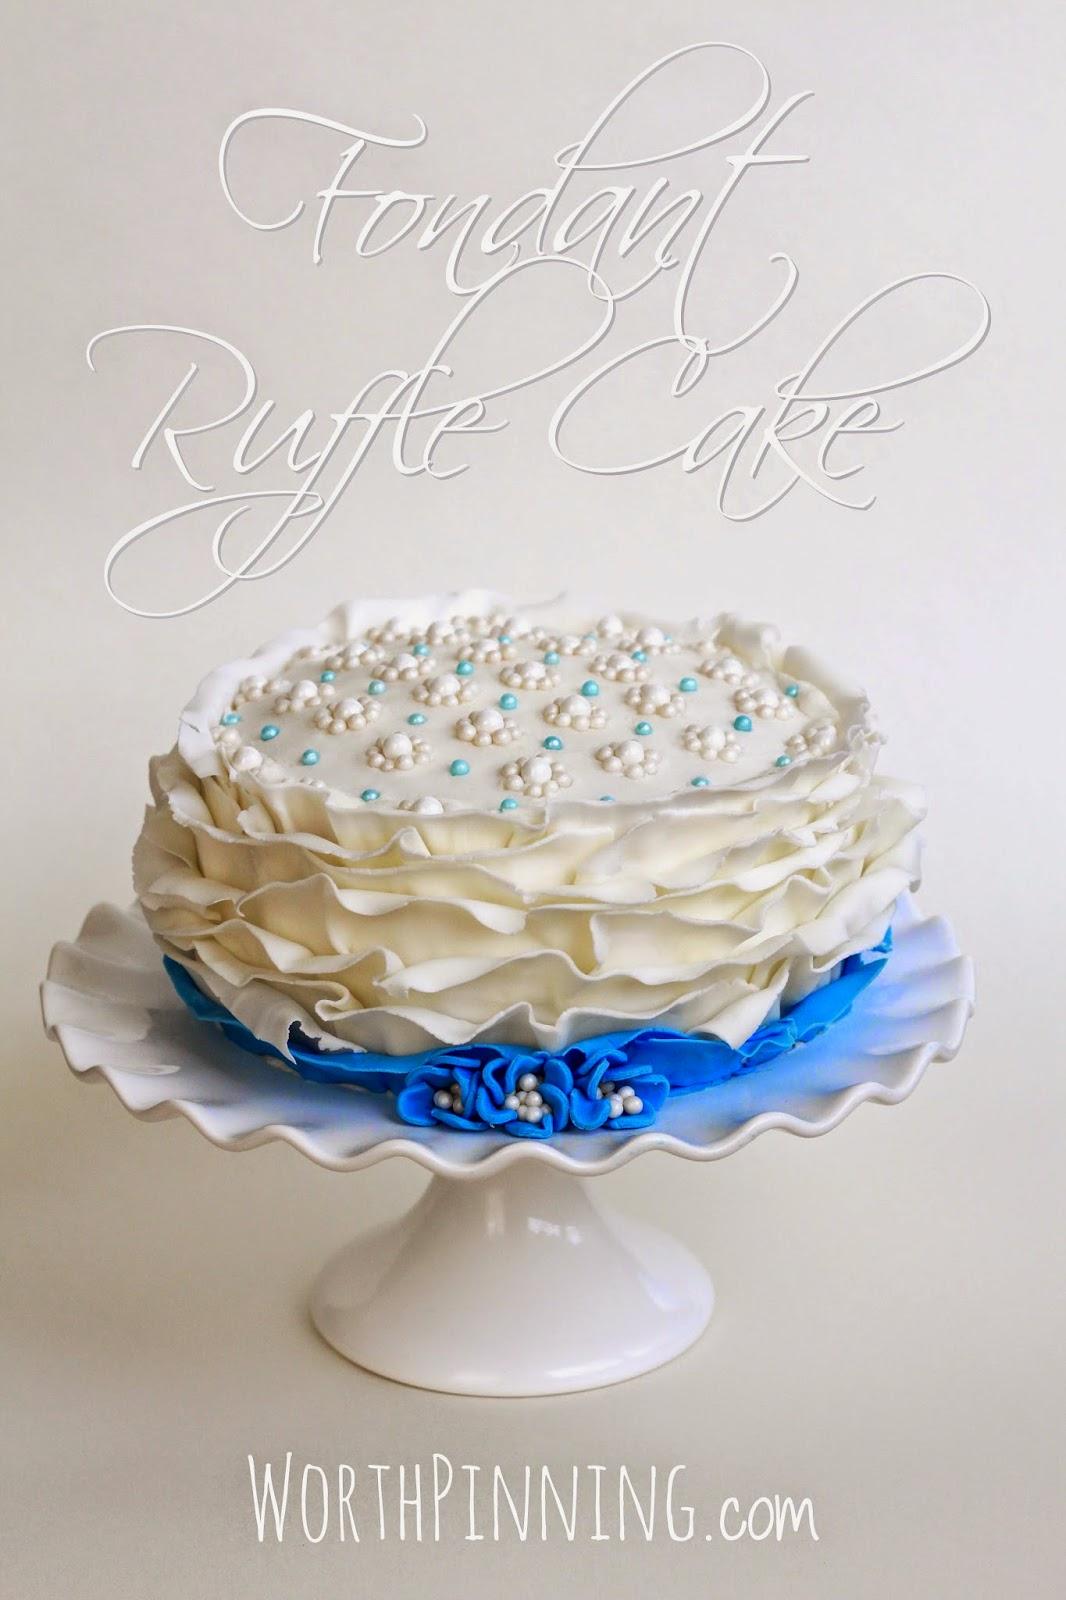 Worth Pinning Fondant Ruffle Cake